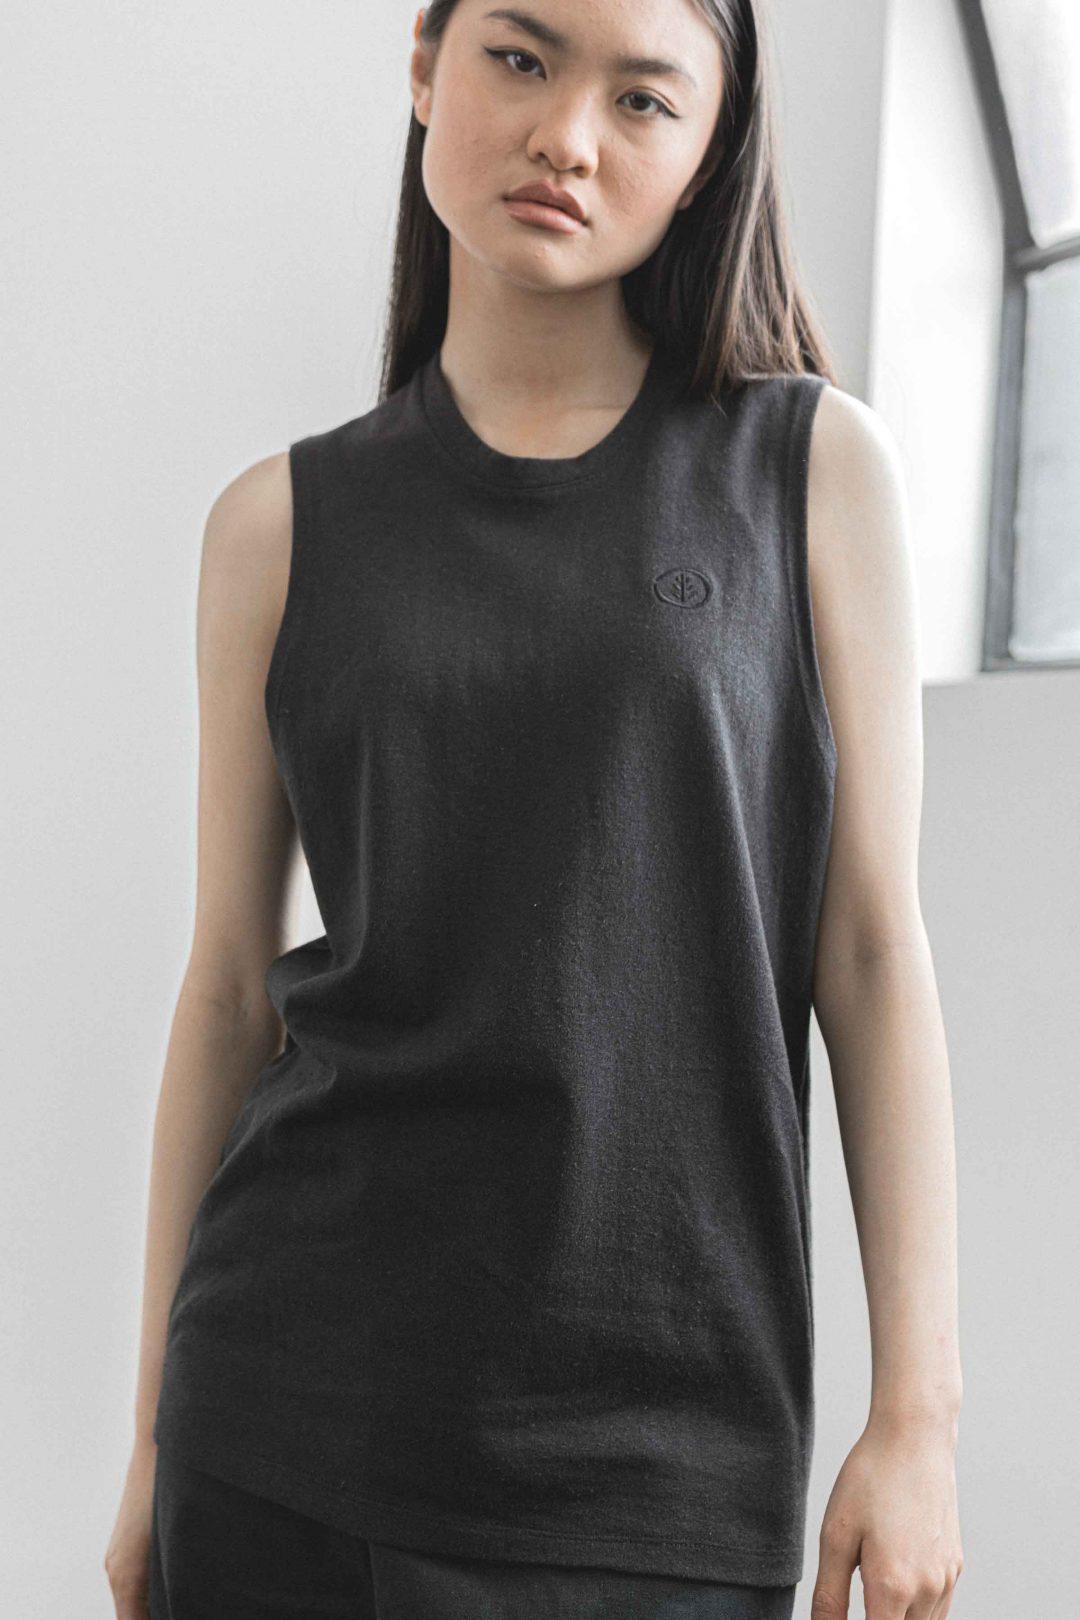 kodama apparel - hankai muscle tee black6